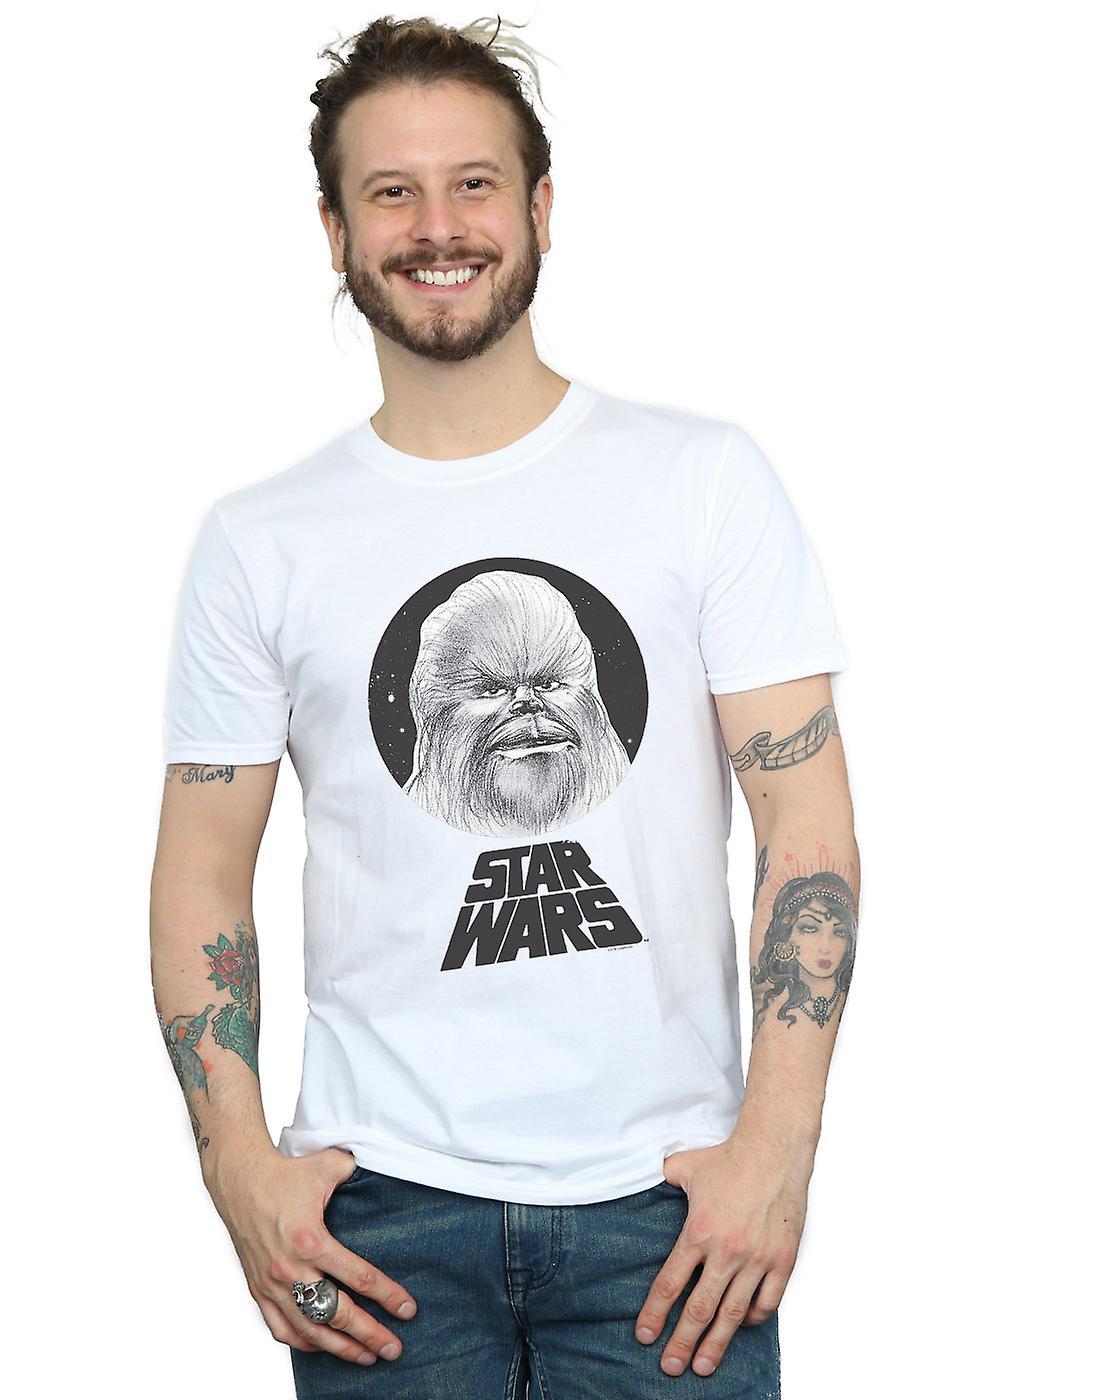 Star Wars Men's Chewbacca Sketch T-Shirt